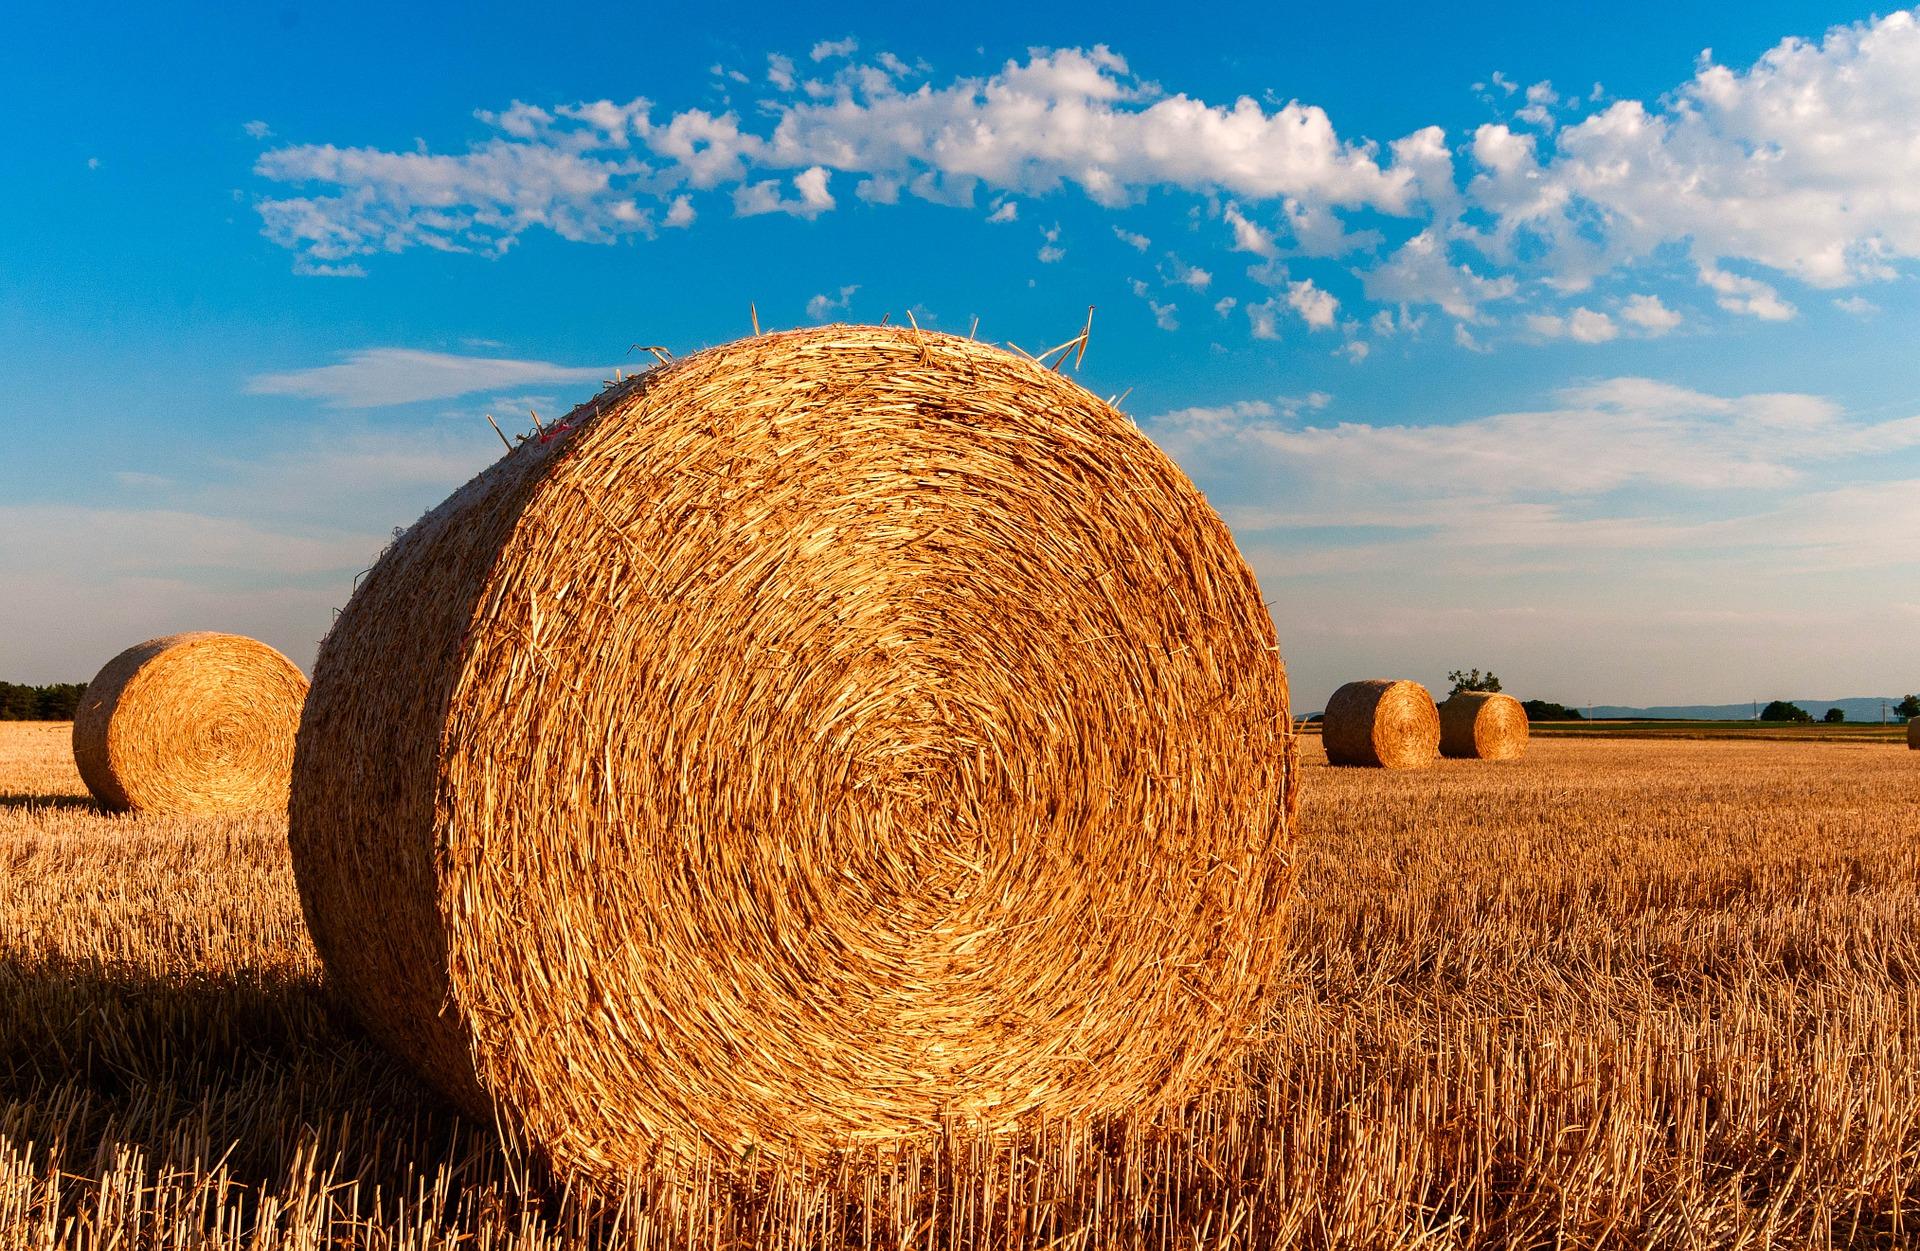 straw-bales-726976_1920